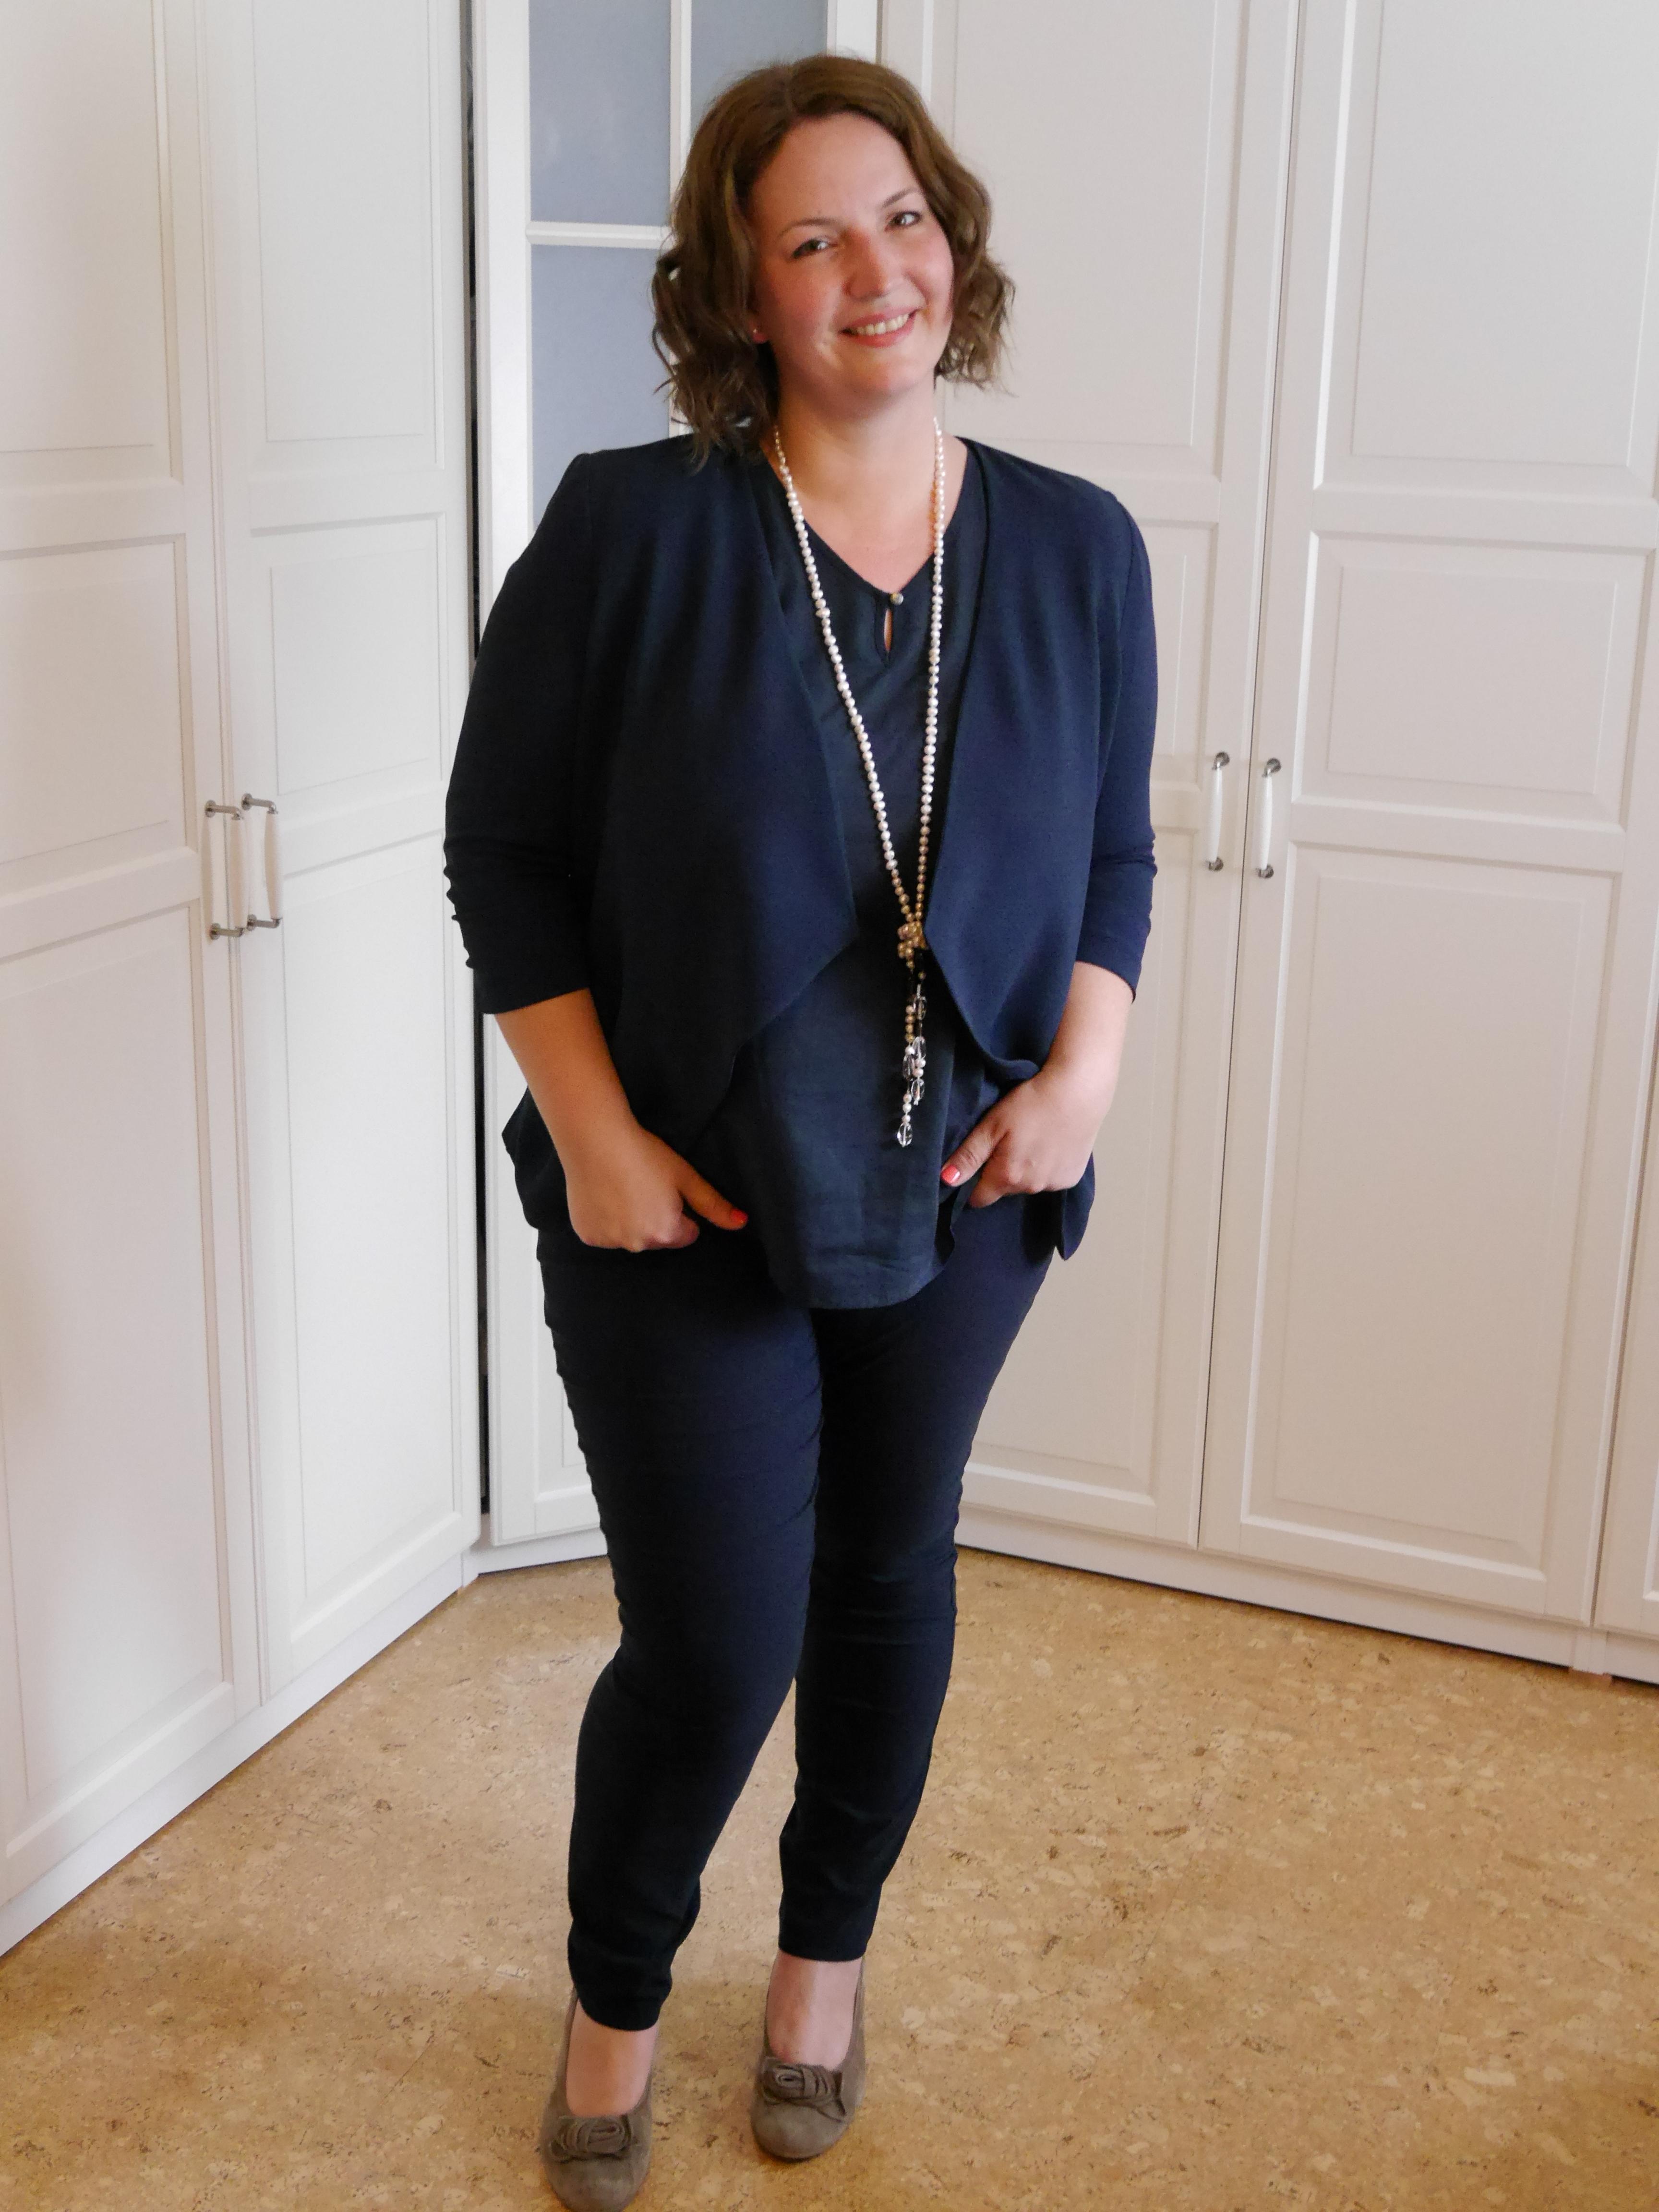 Büro-Outfit